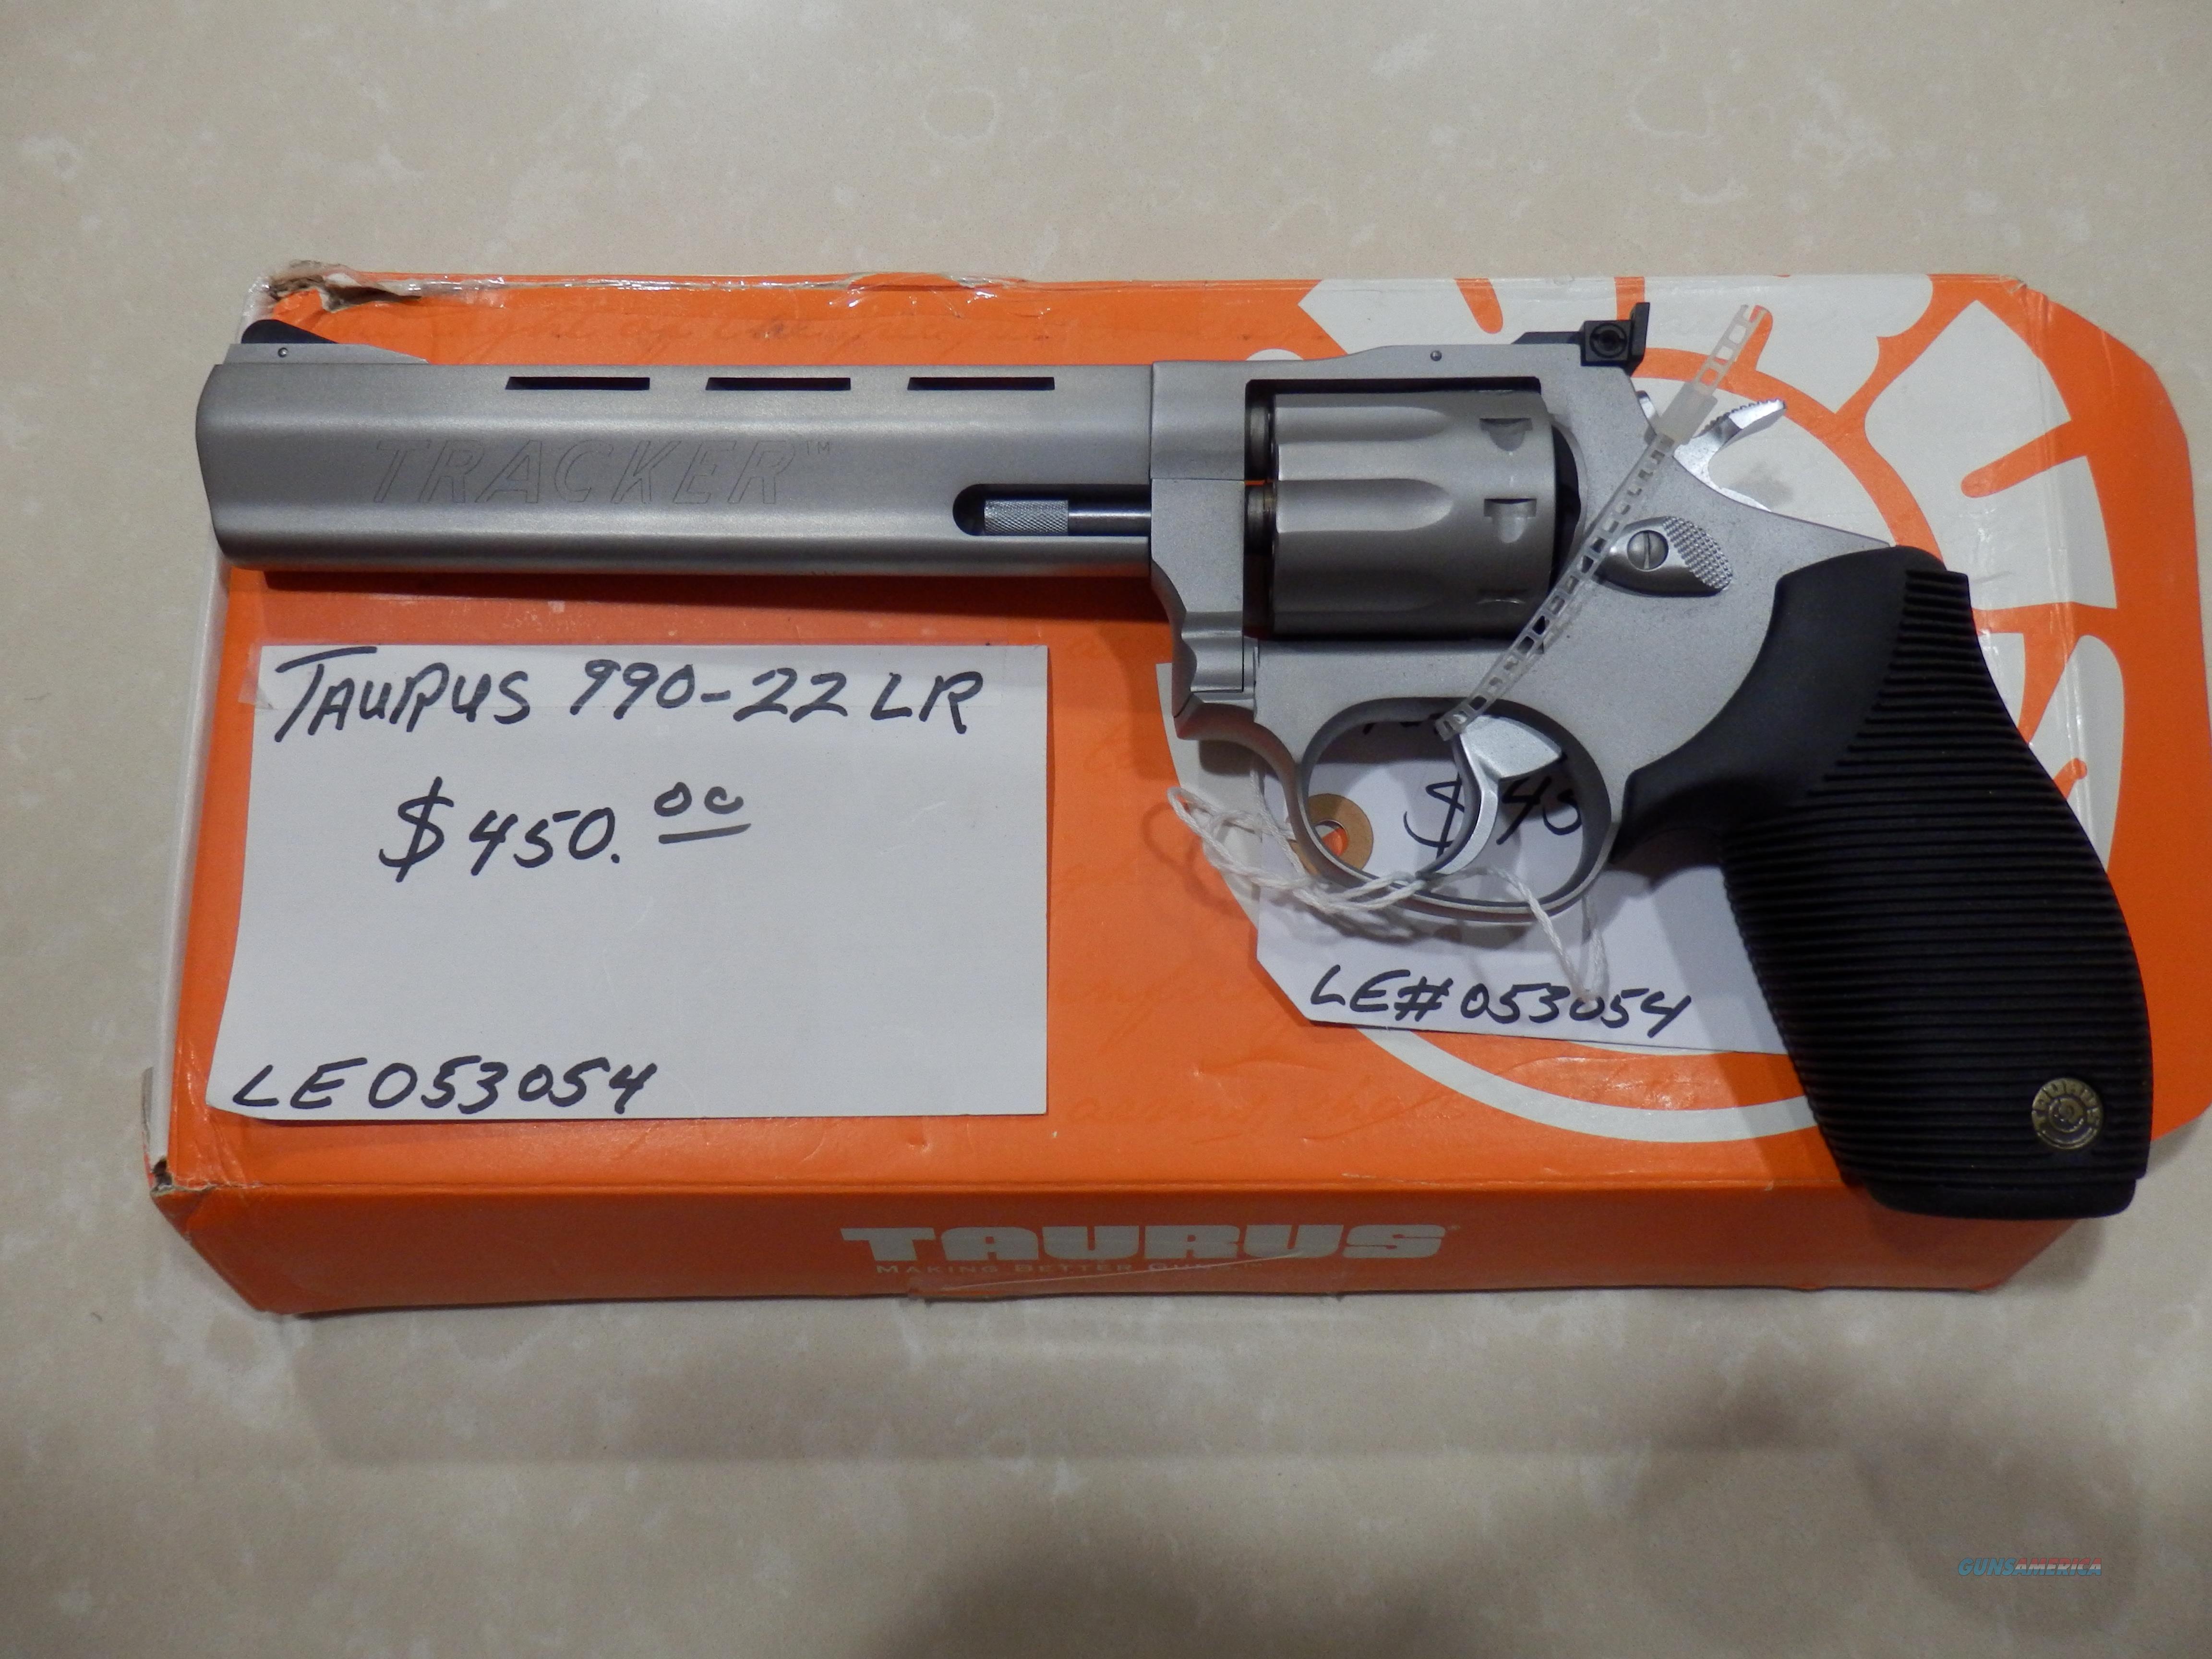 Tuarus 990-22LR  Guns > Pistols > Taurus Pistols > Revolvers